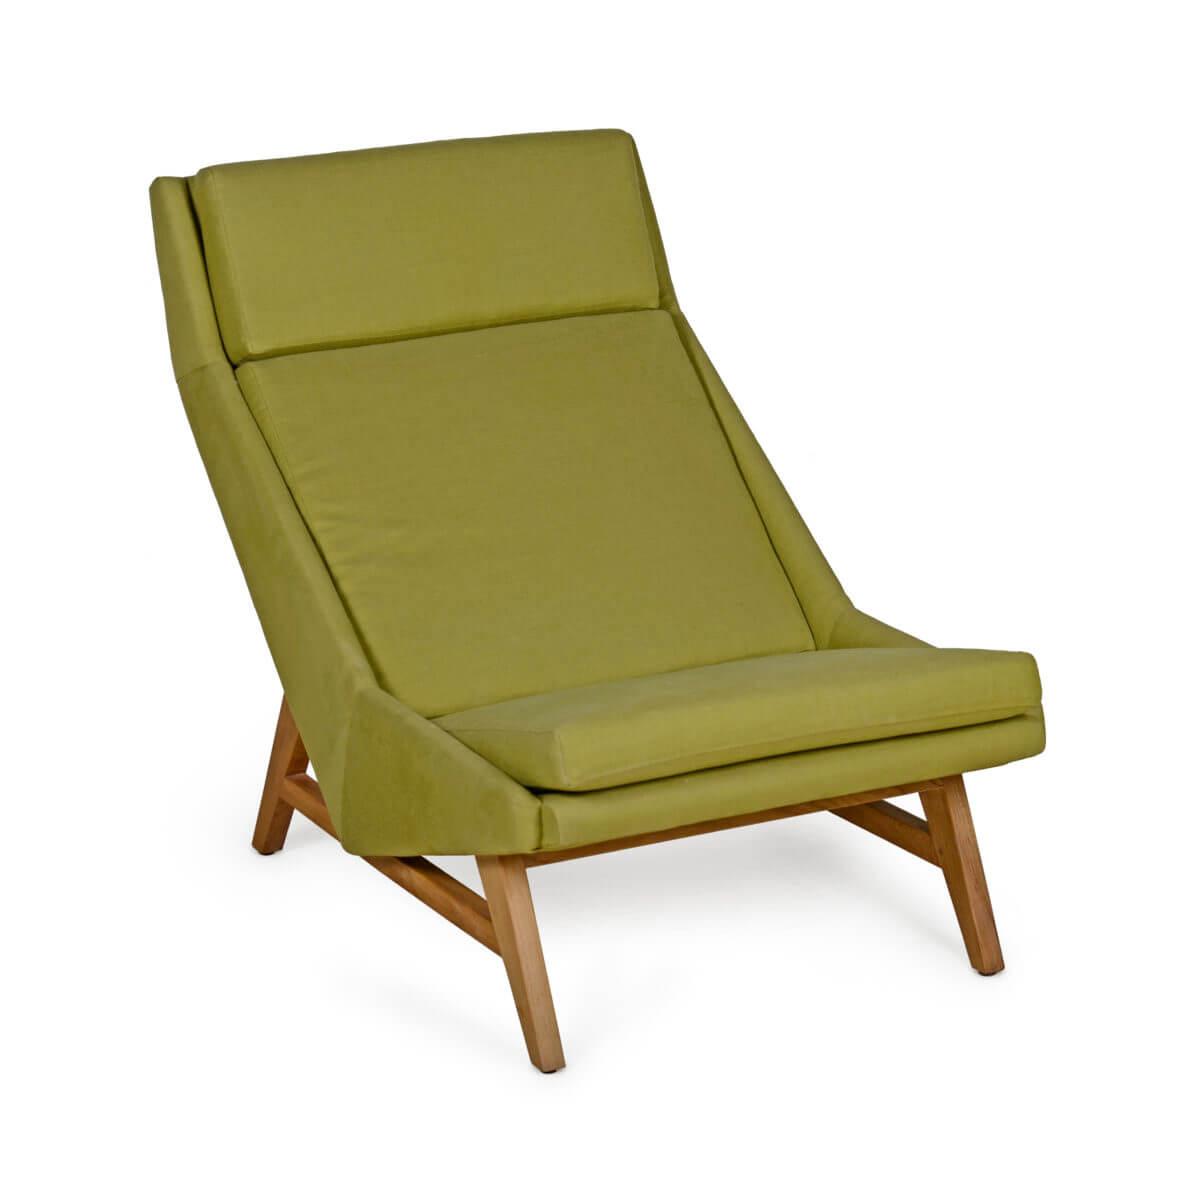 Boomerange Lounge Chair No Arm Oriental Living Phuket